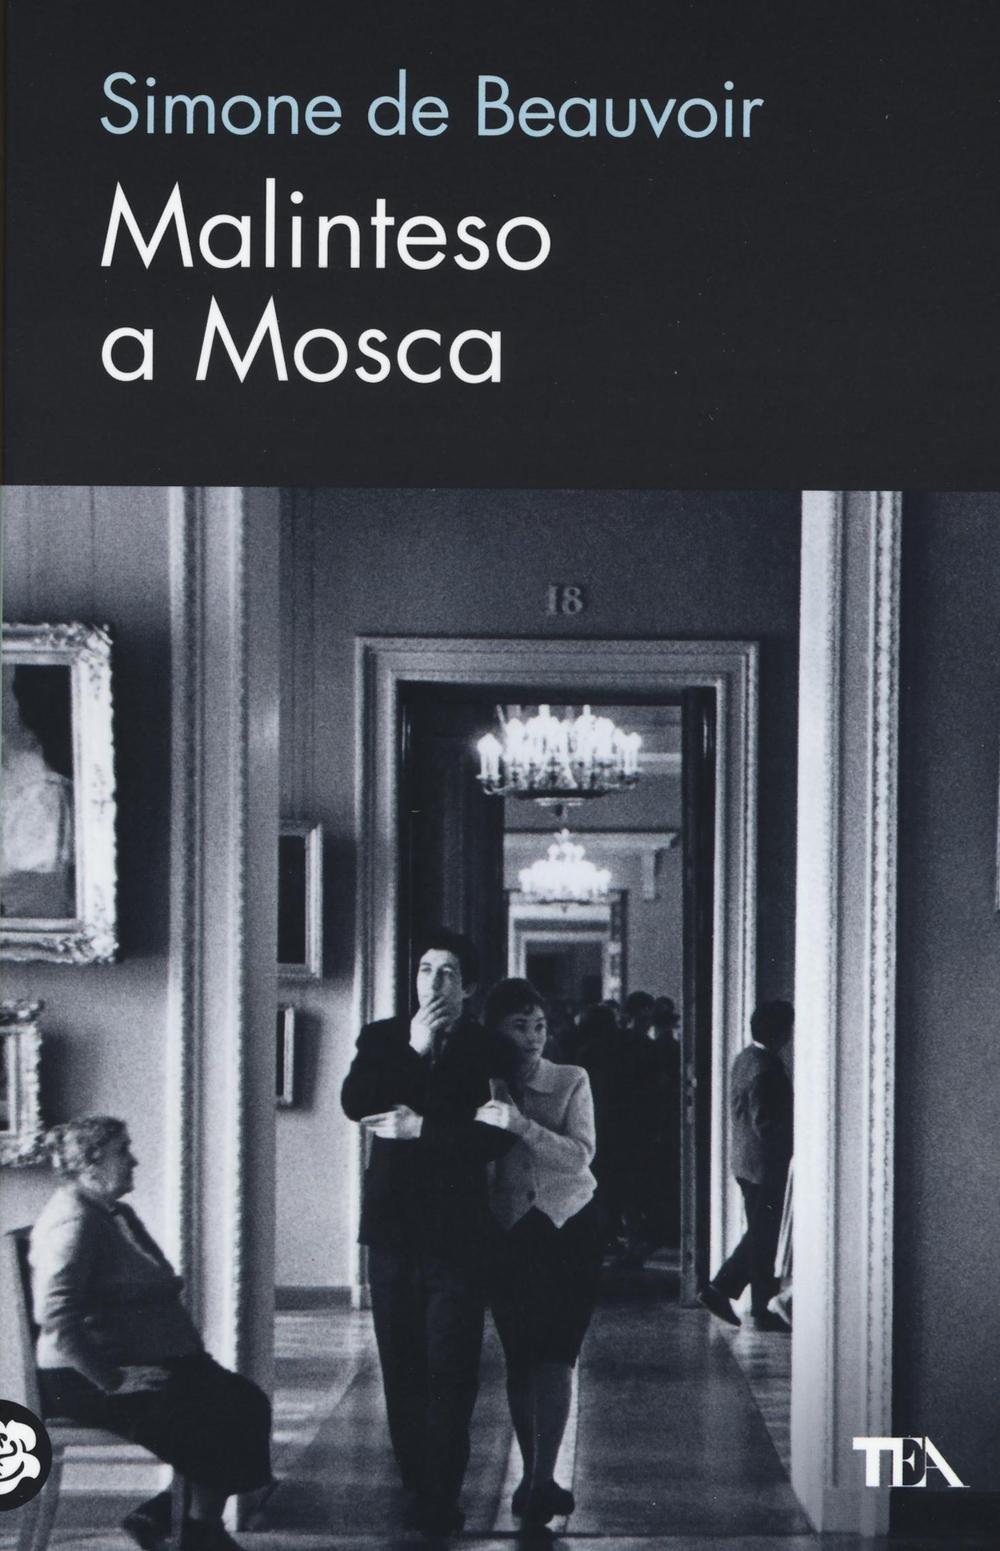 Malinteso a Mosca